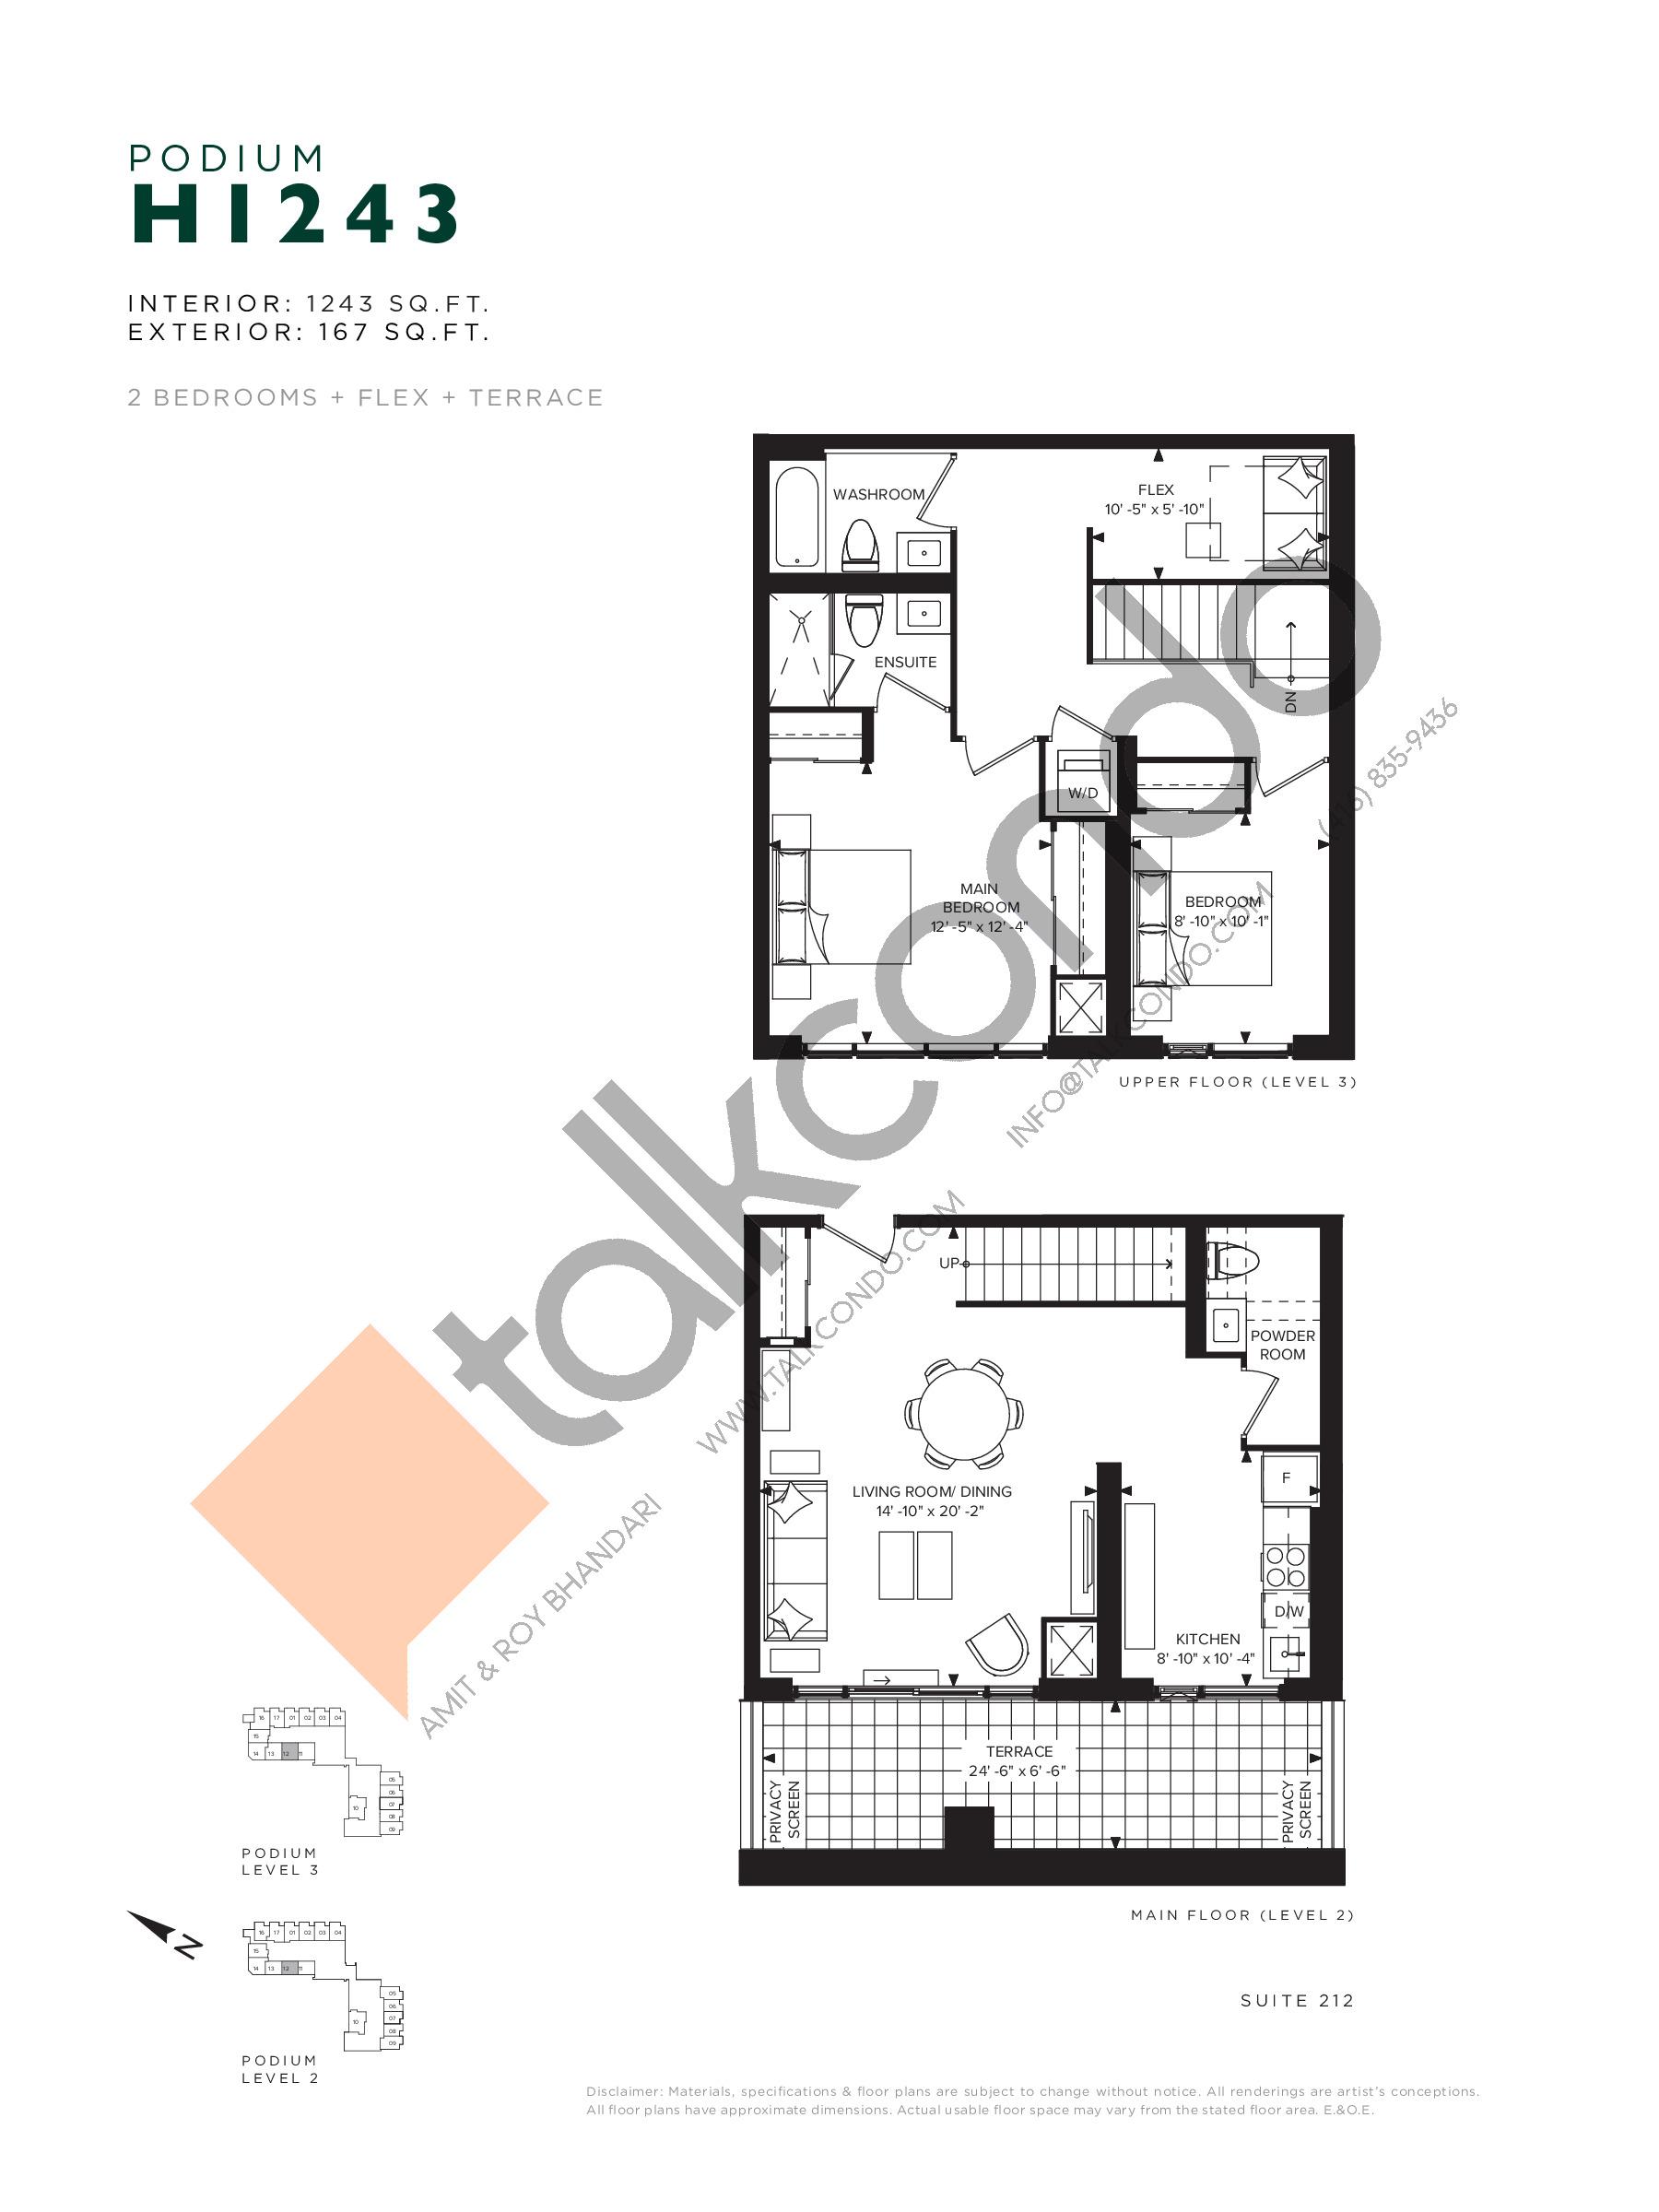 H1243 (Podium) Floor Plan at Hillmont at SXSW Condos - 1243 sq.ft